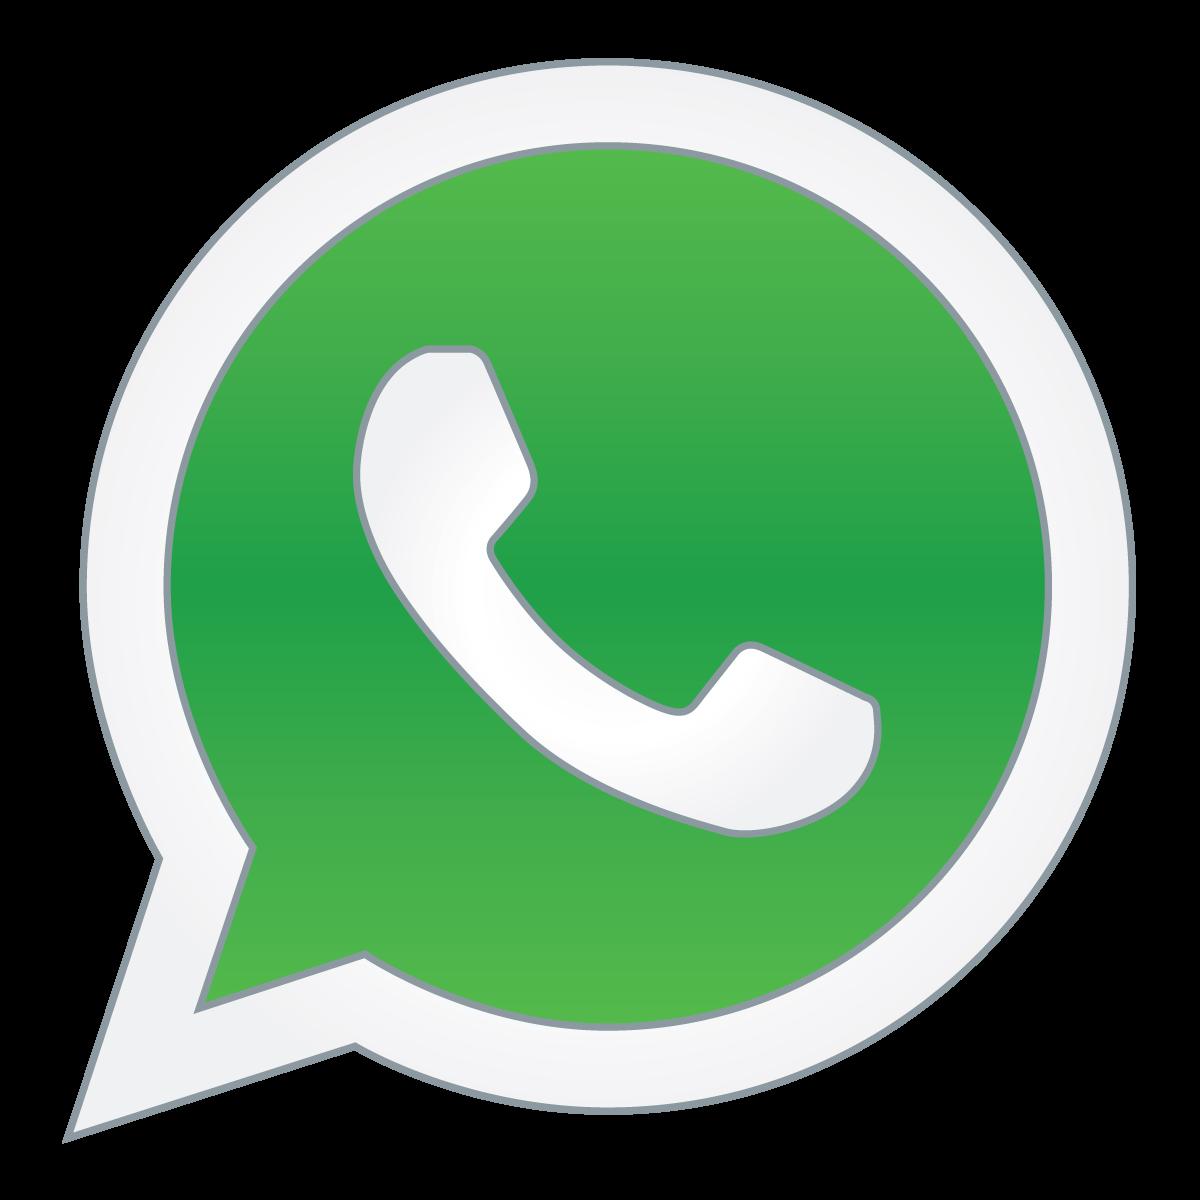 Logo WhatsApp - 237 Design